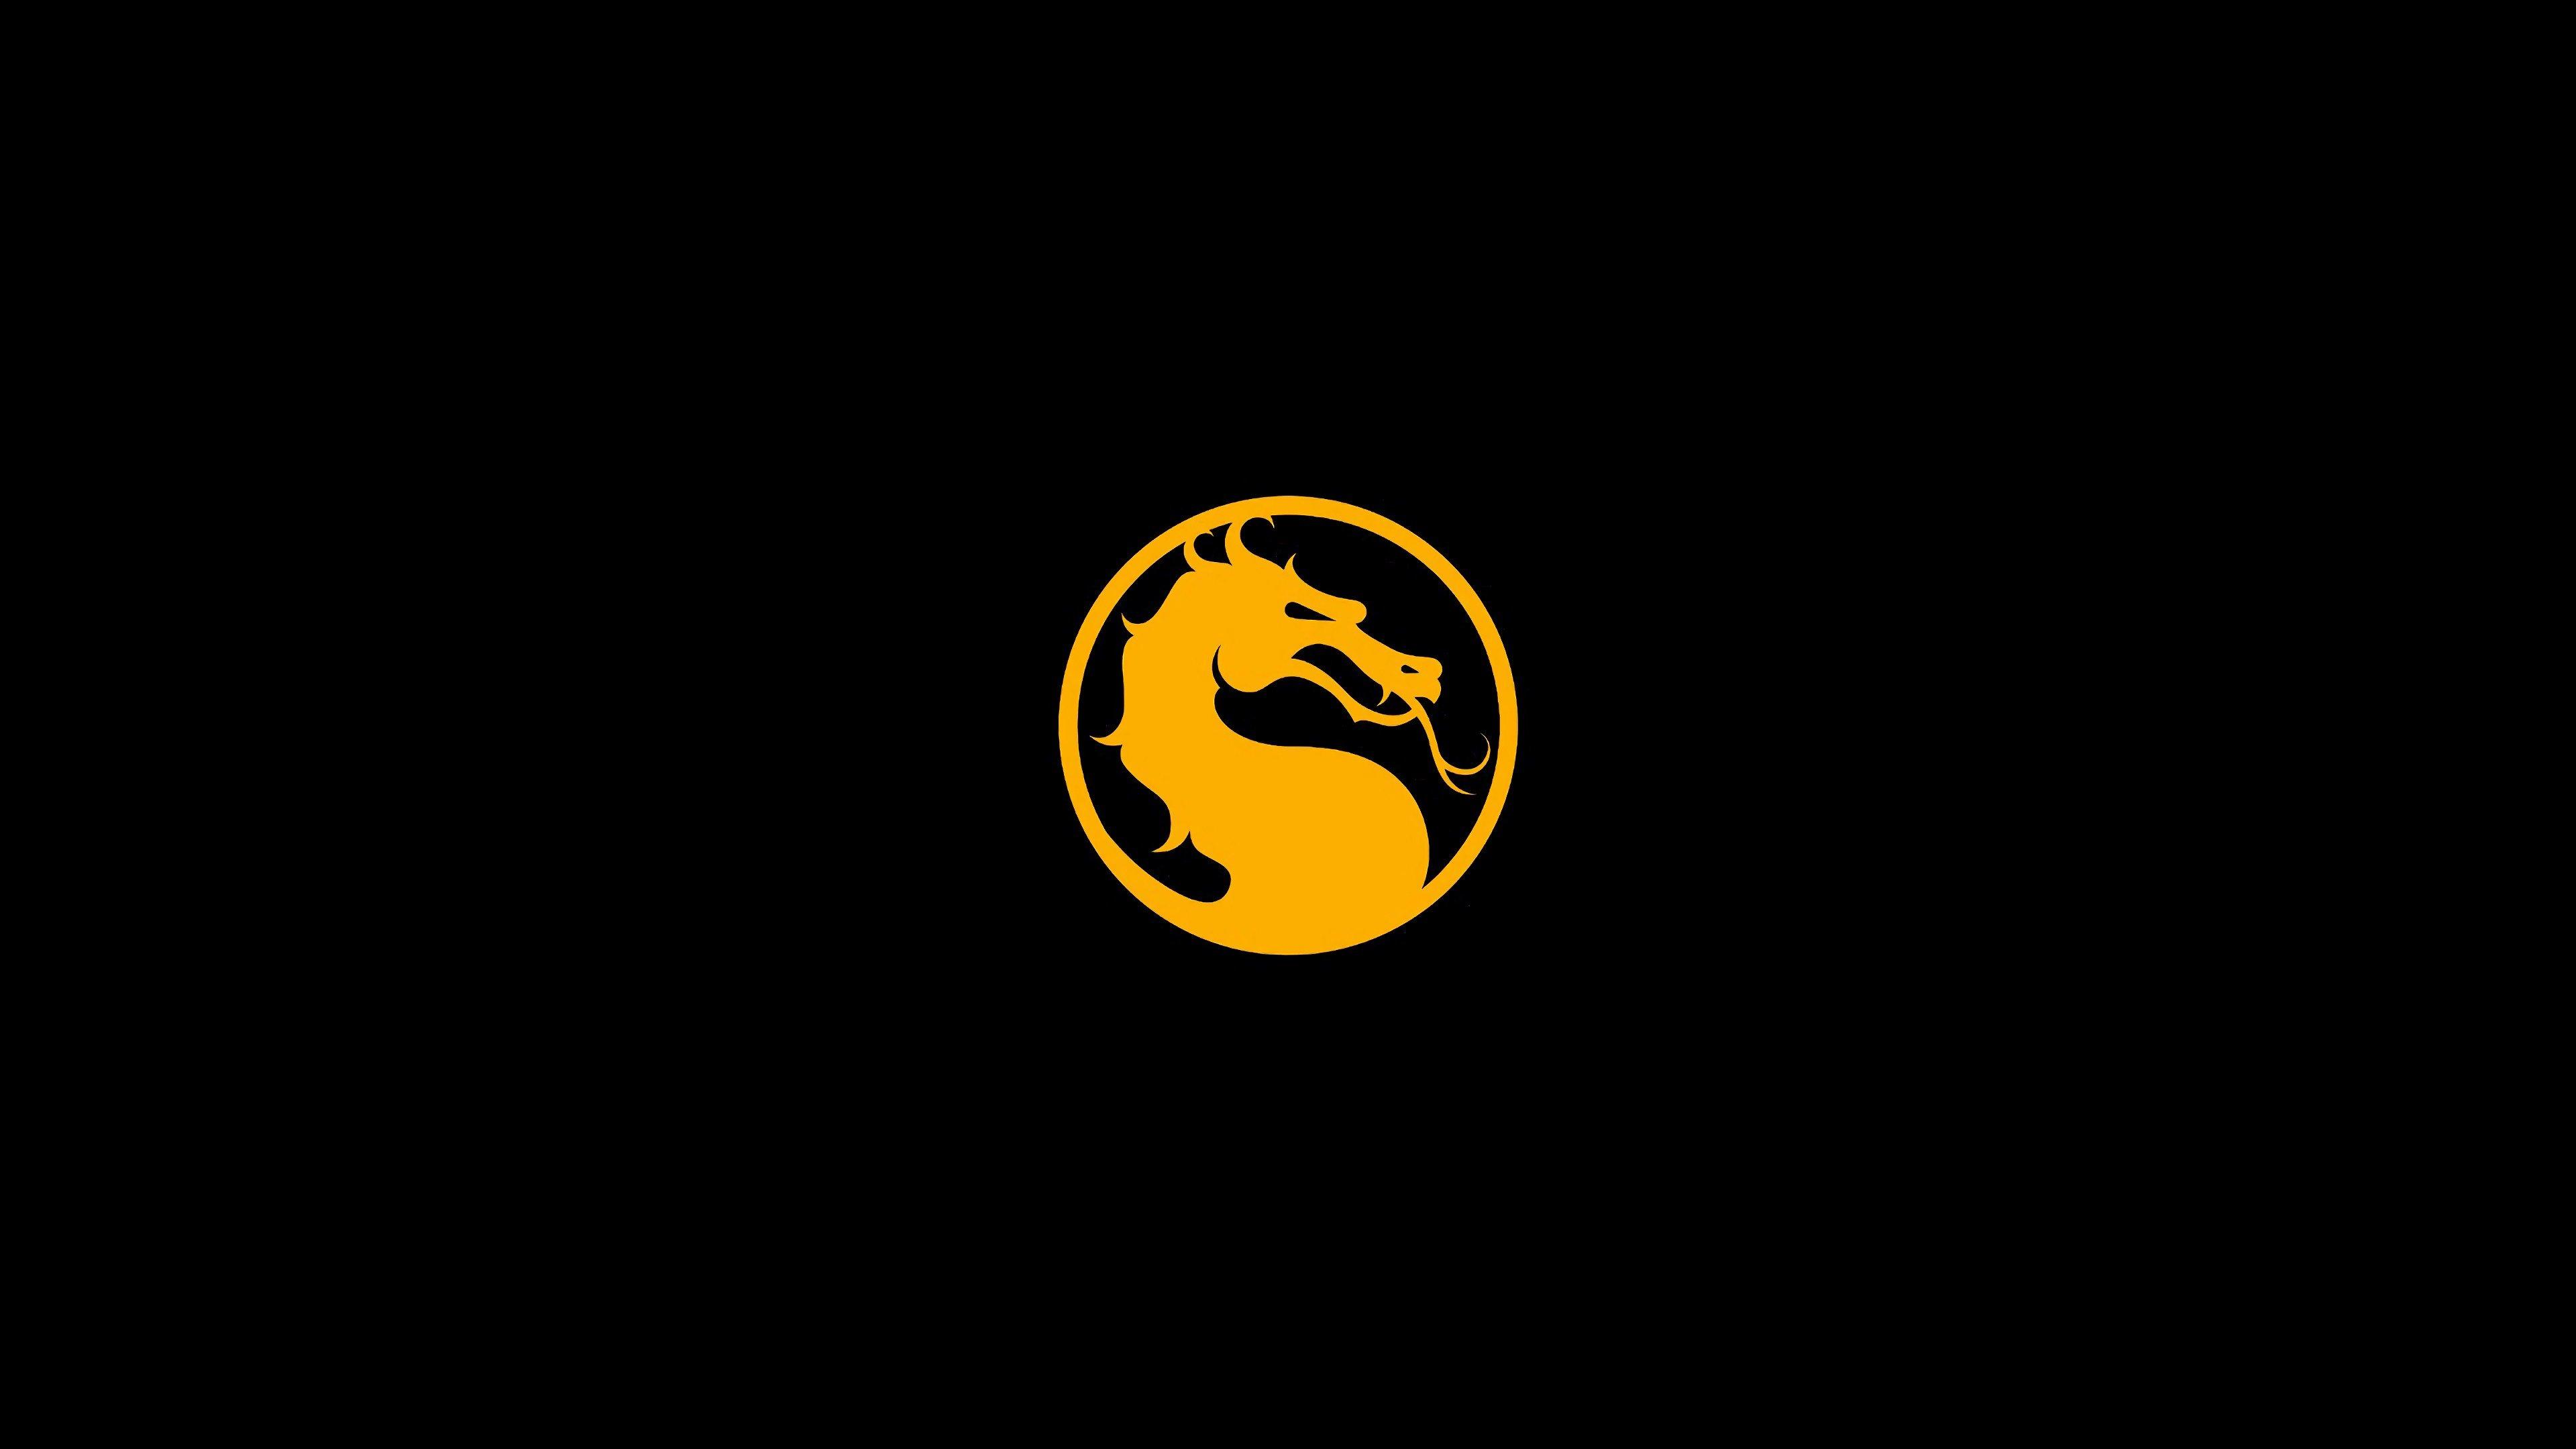 Fondos de pantalla Mortal Kombat 11 Logo Dragón